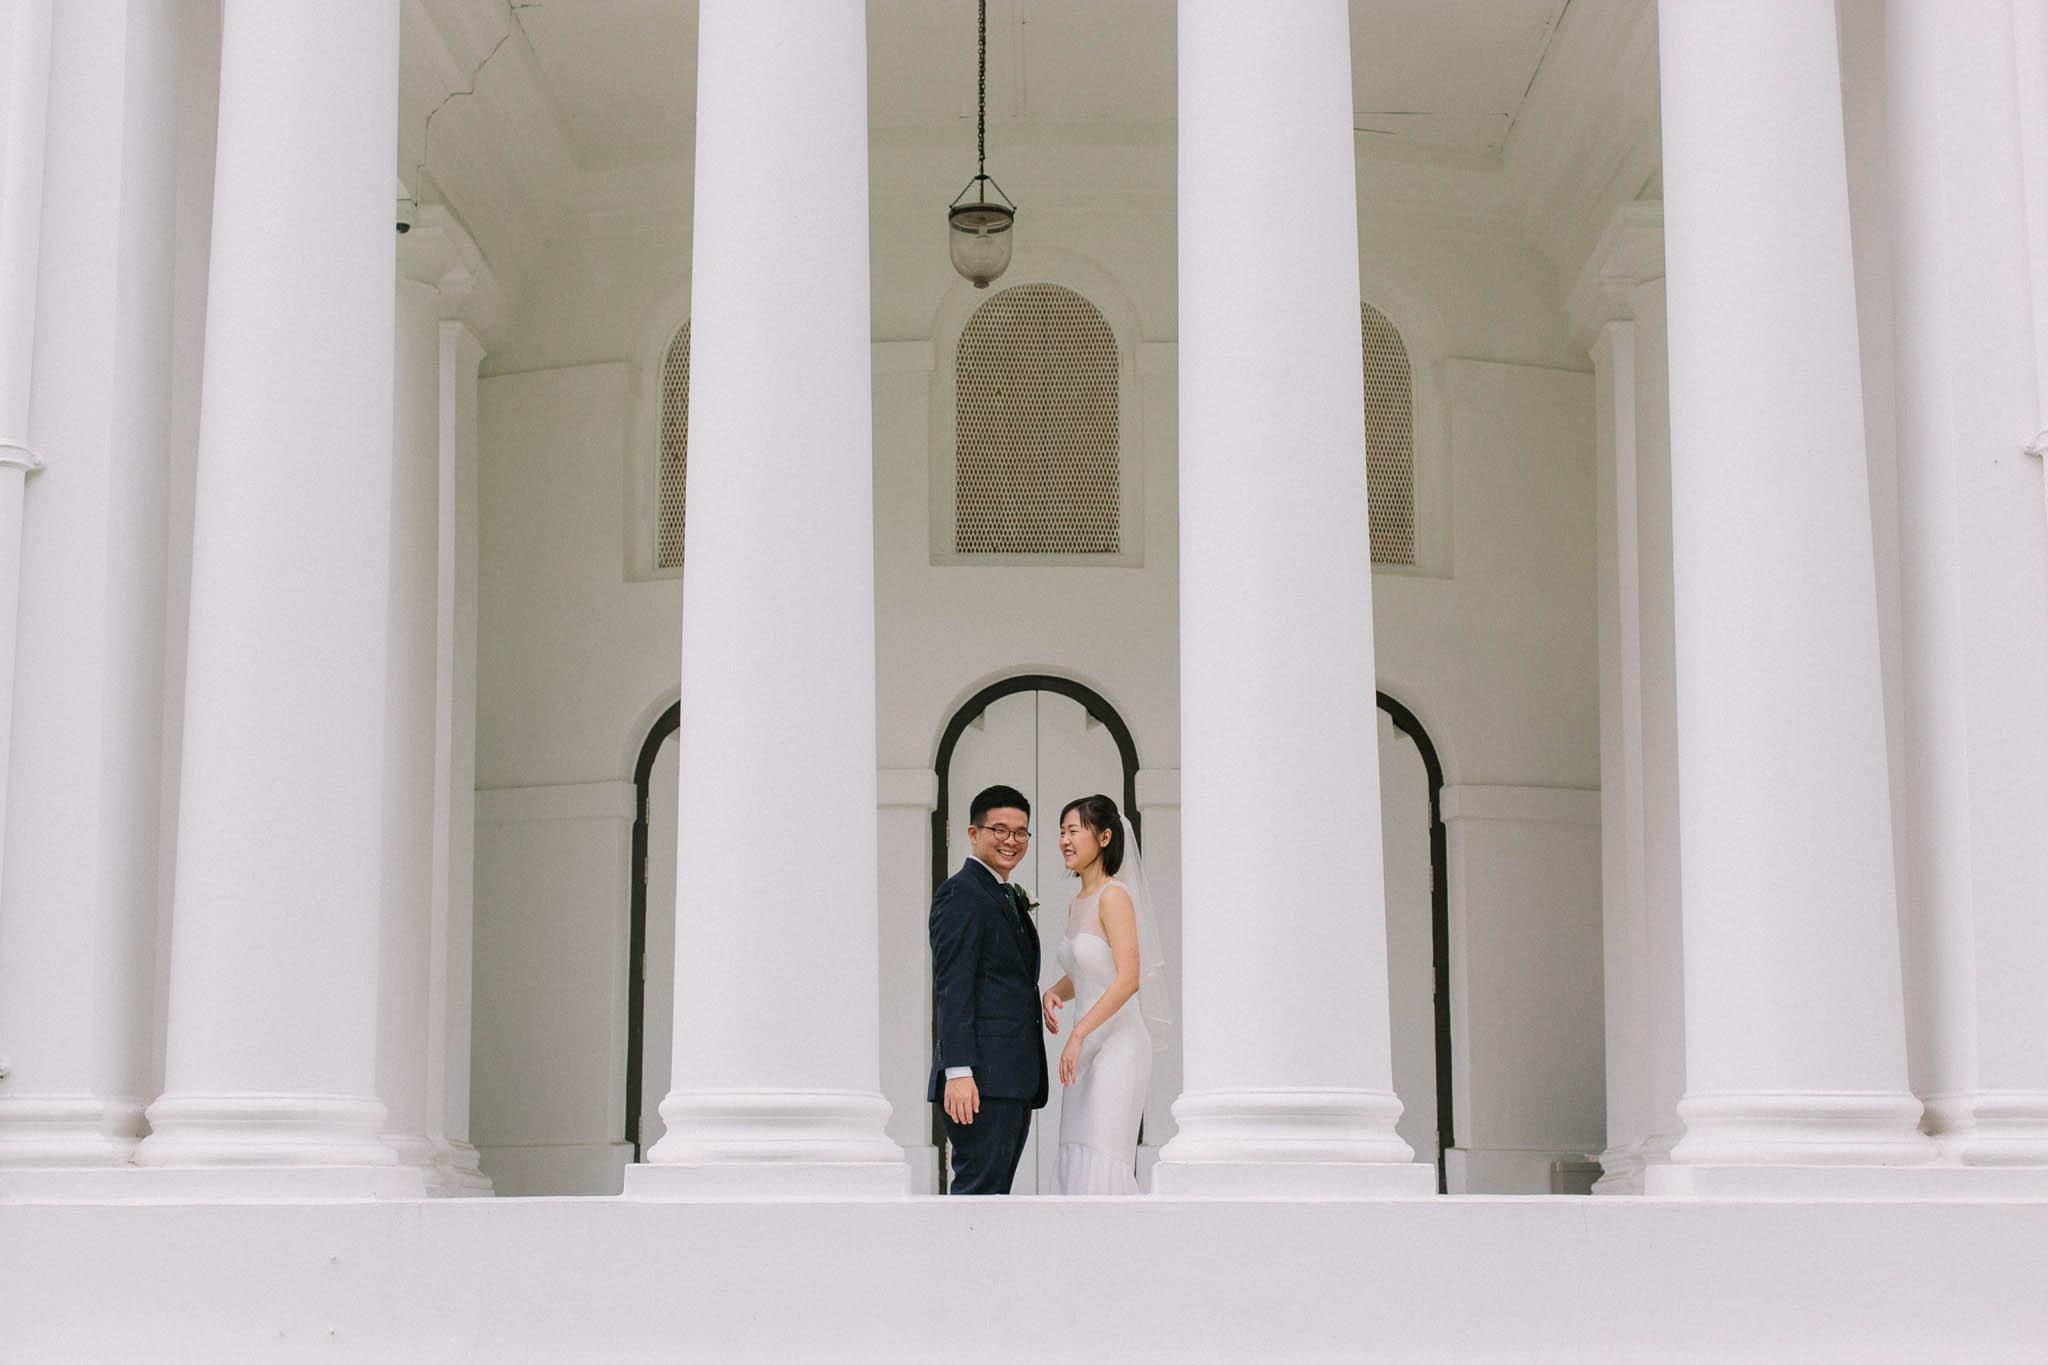 singapore-wedding-photographer-sentosa-foc-mark-eleanor-29.jpg